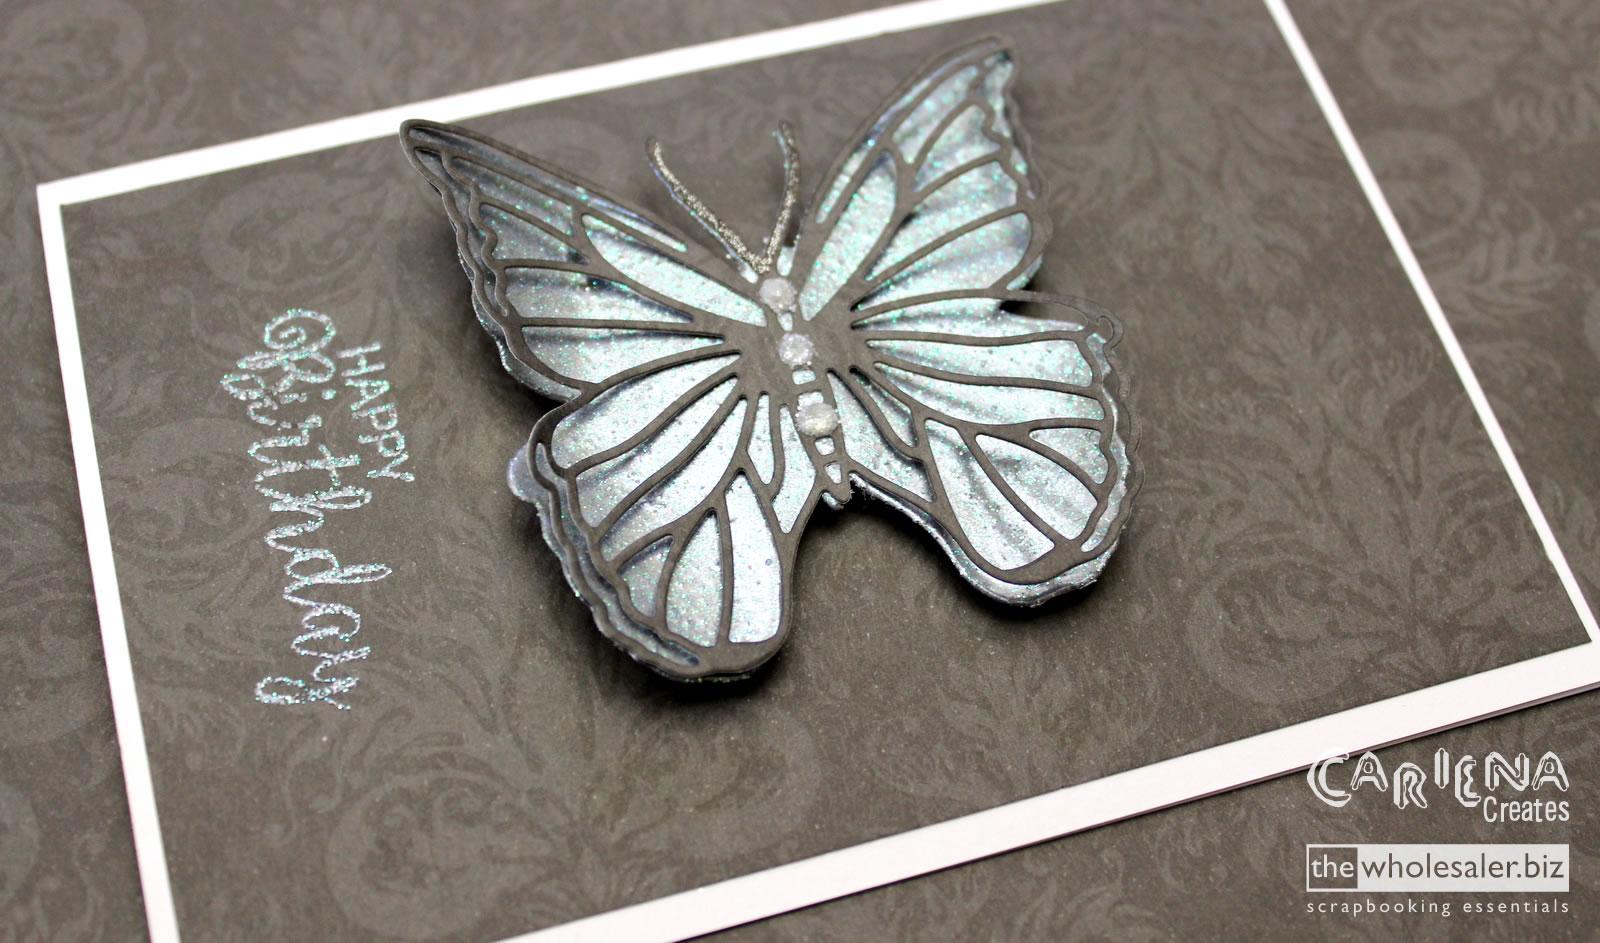 Heat Embossed Butterfly – Cariena Creates